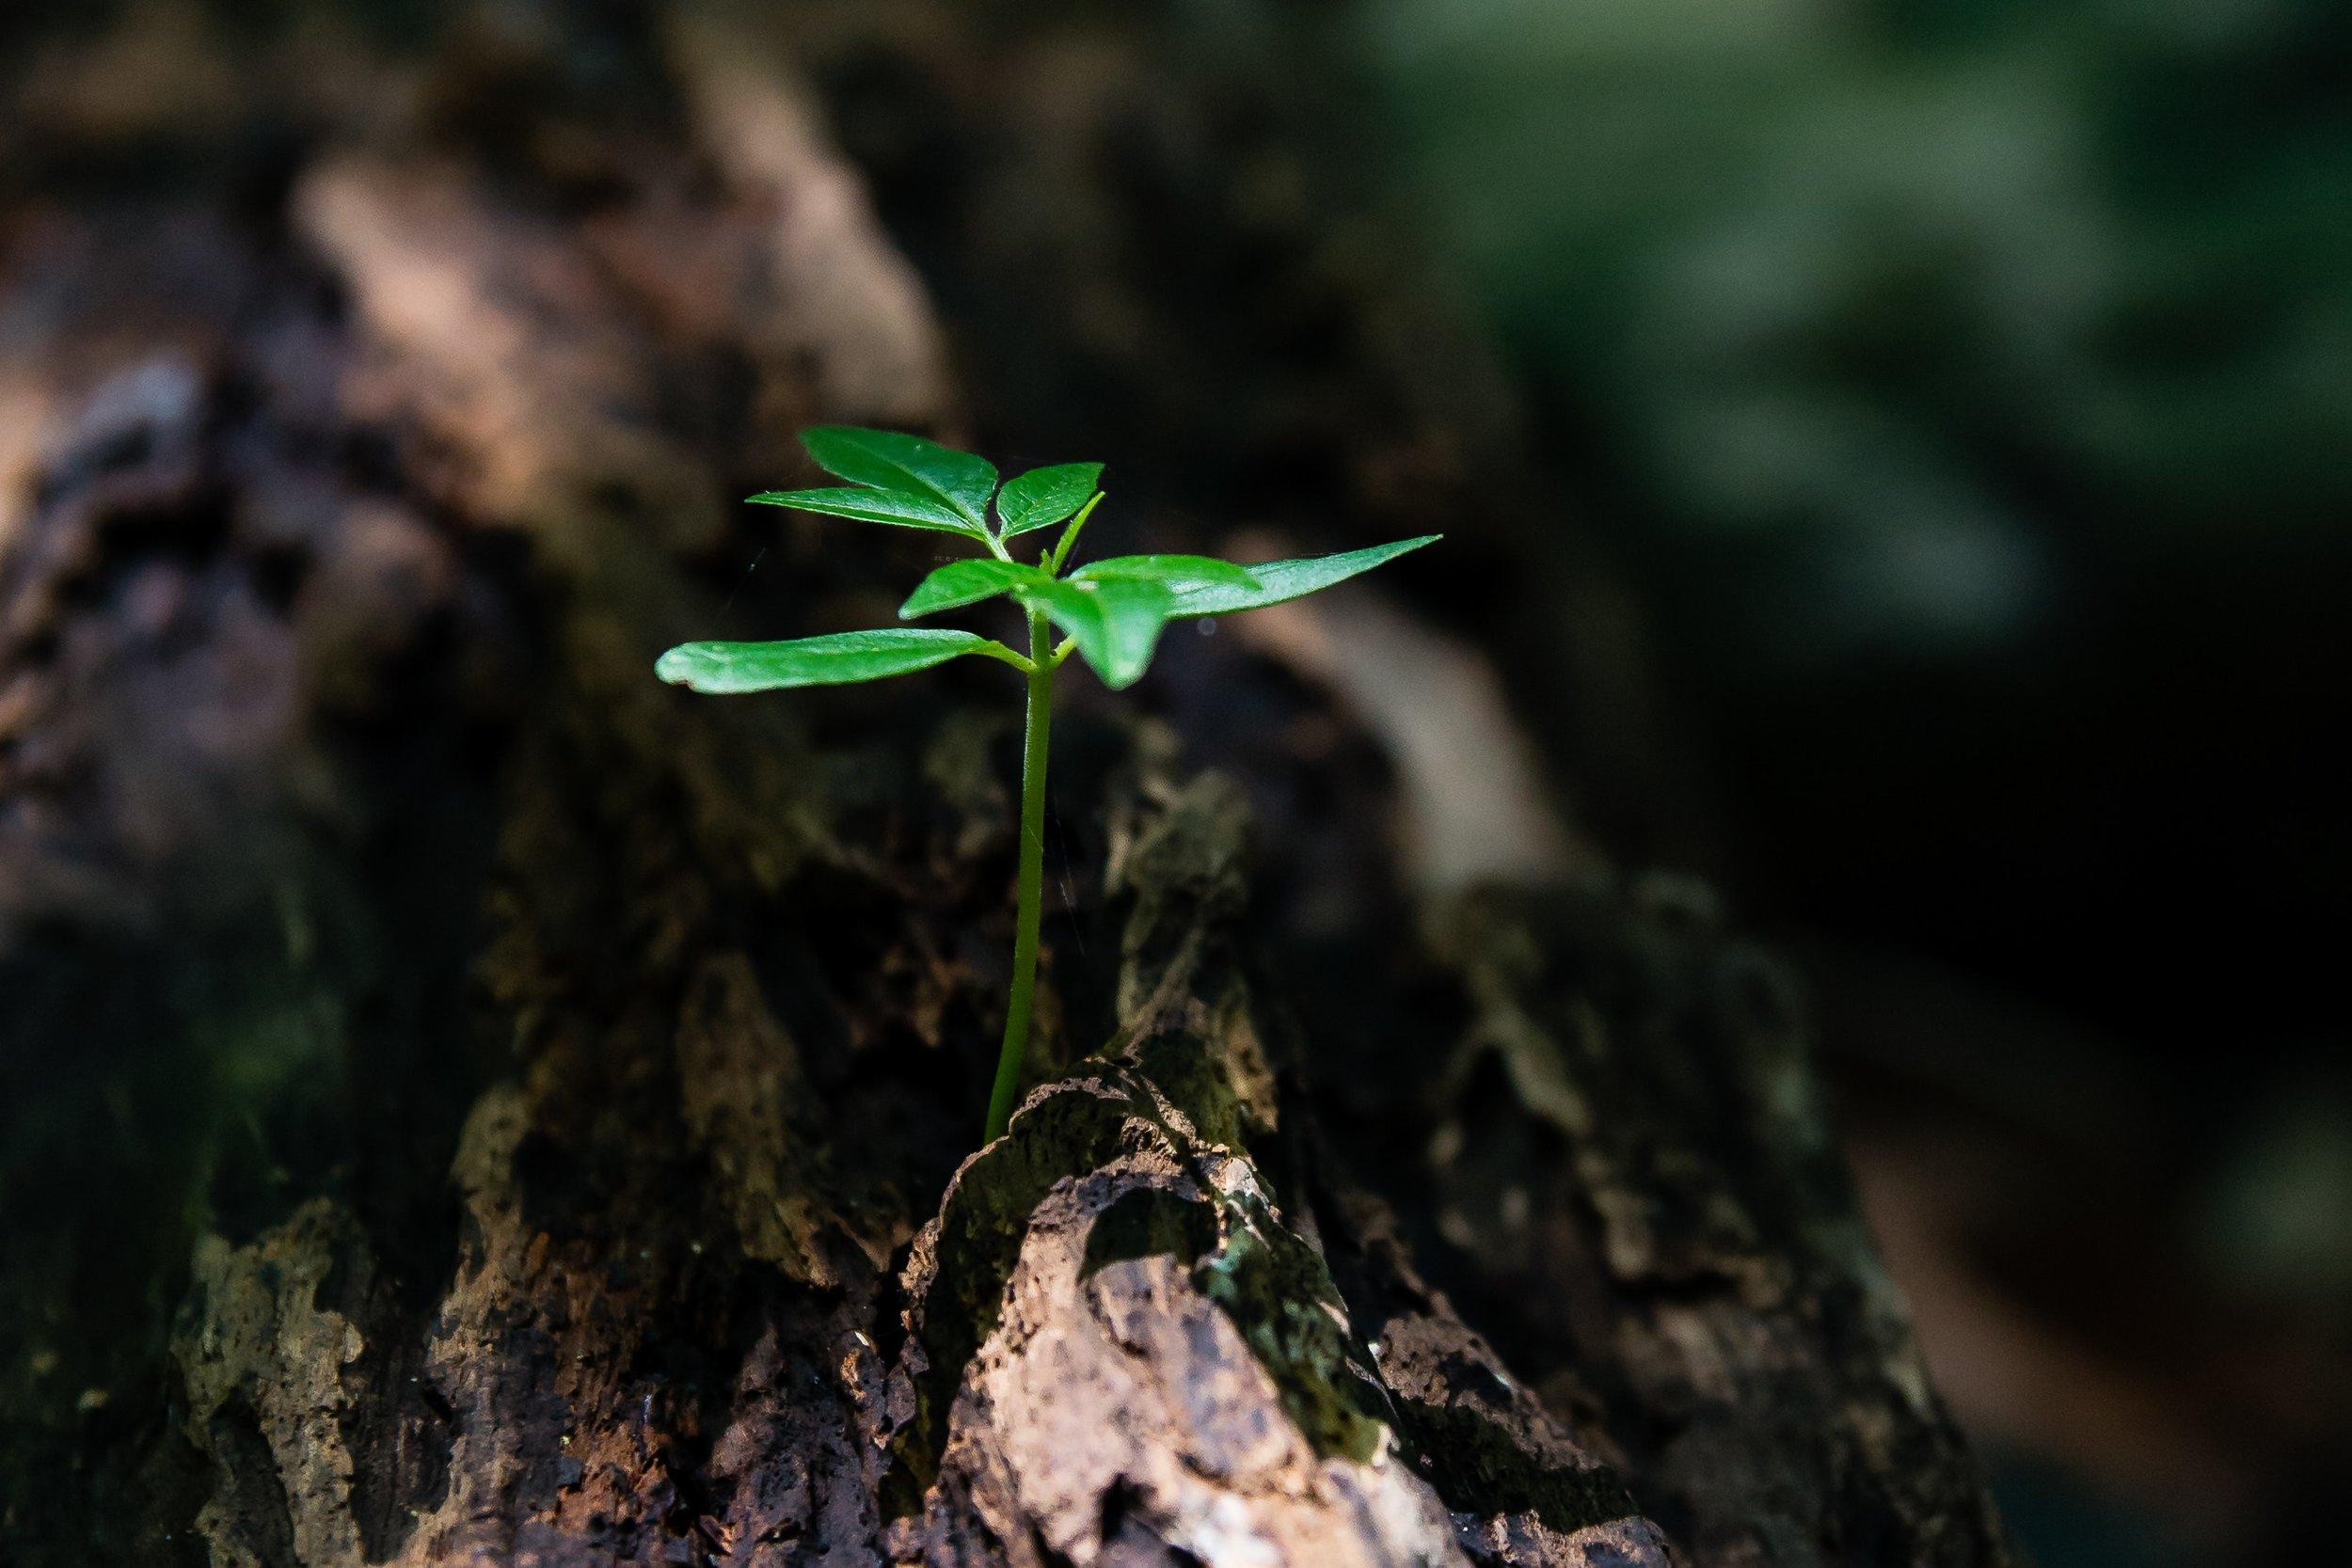 close-up-environment-flora-1151418.jpg